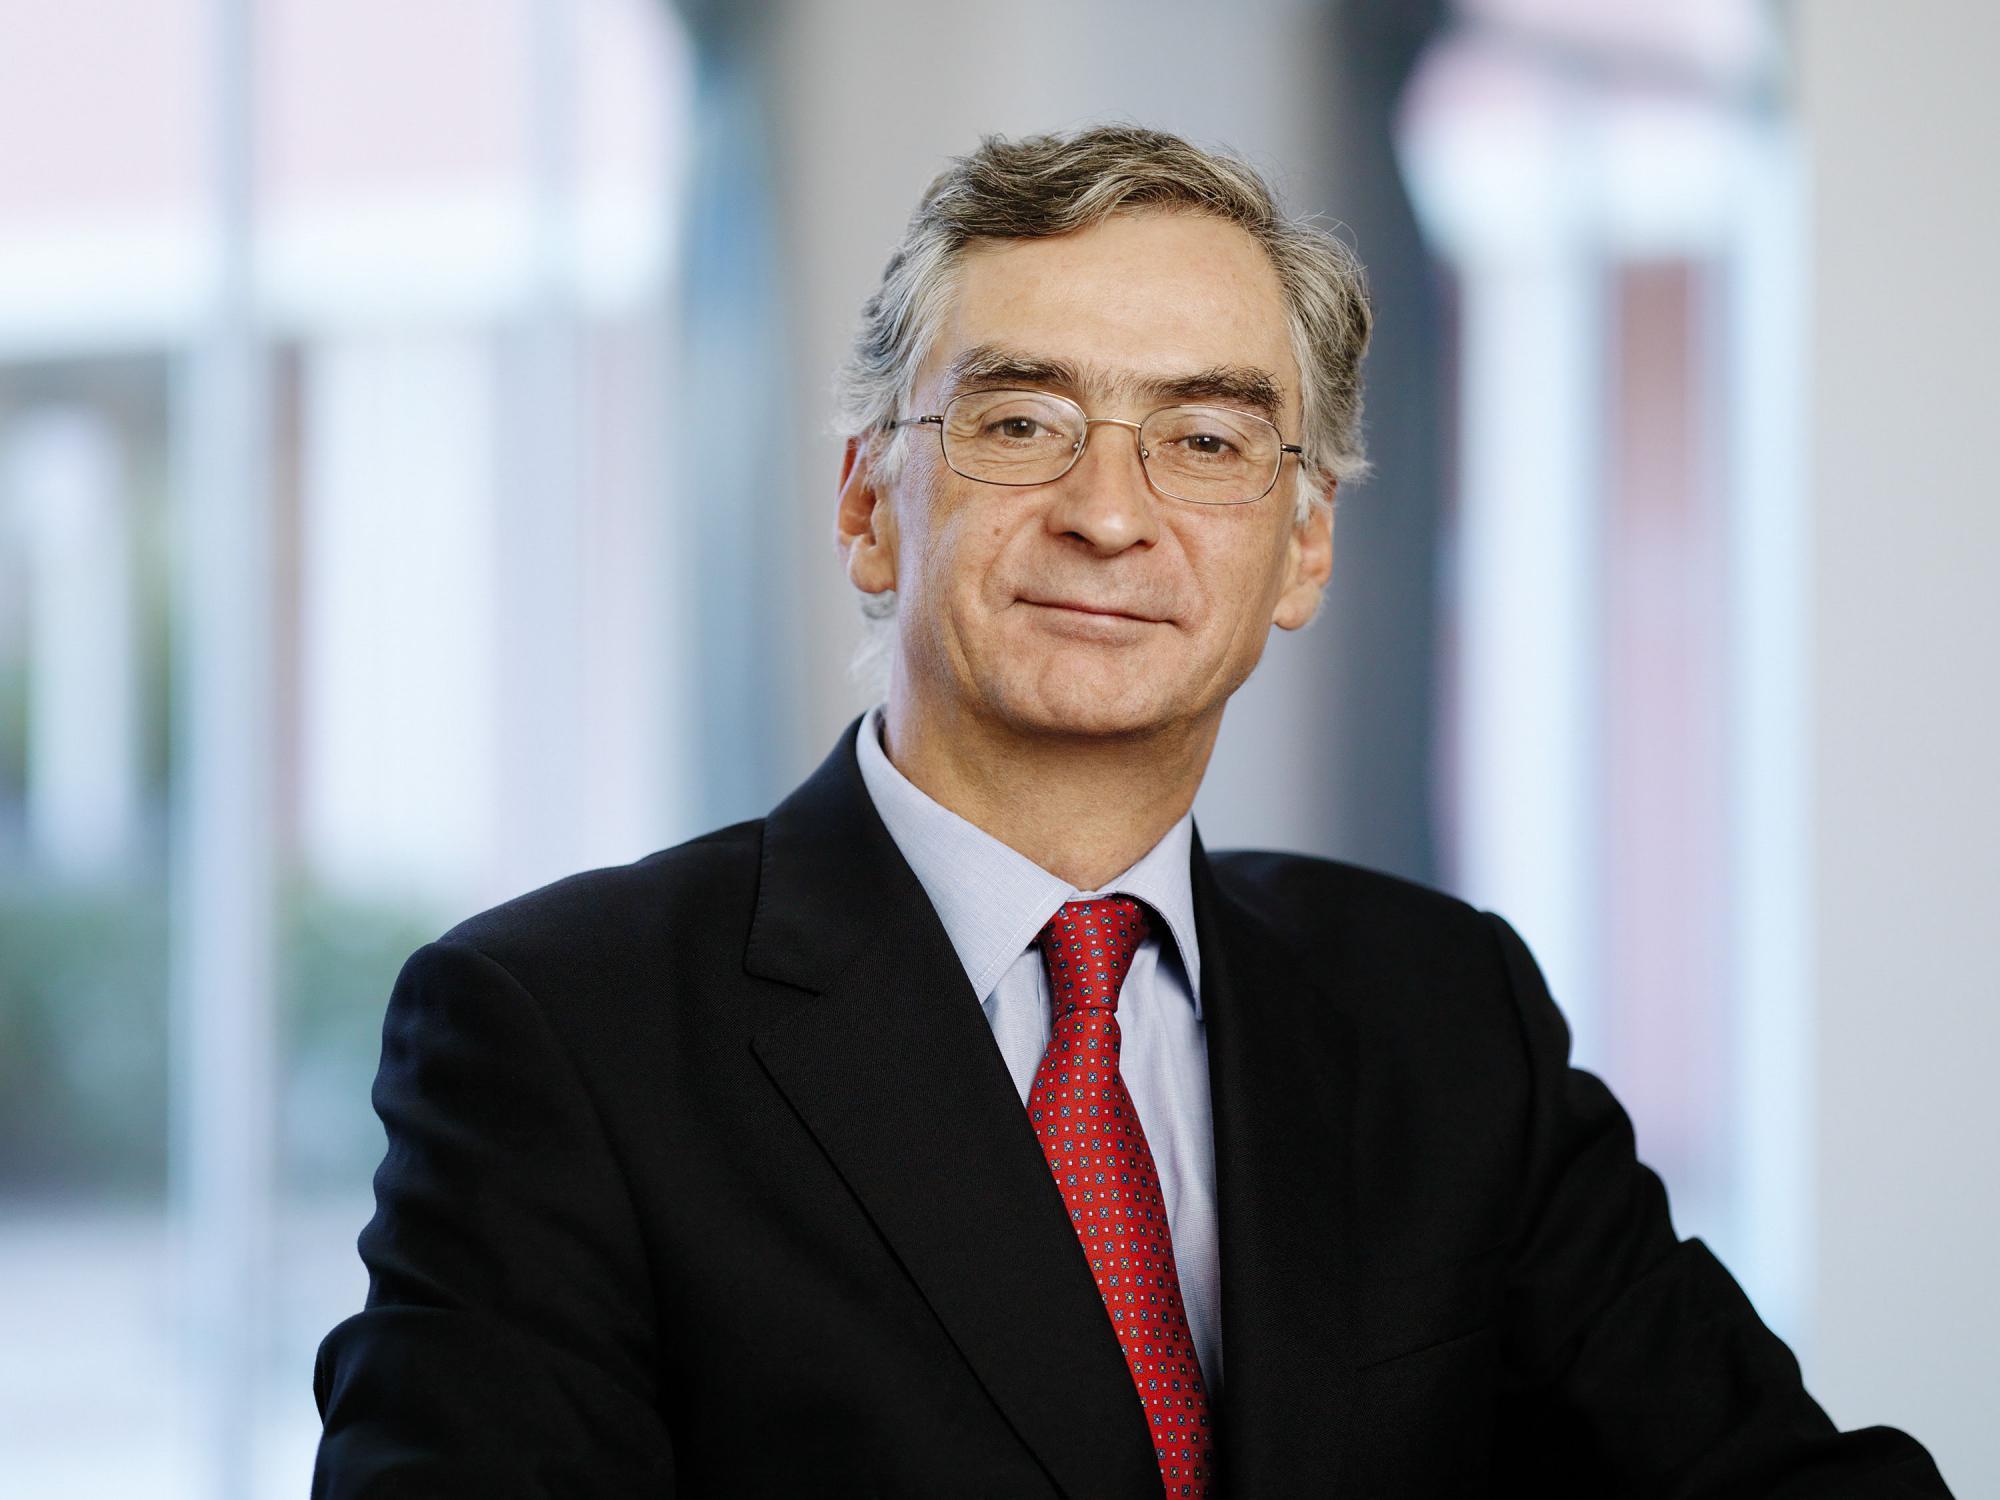 Fernando Guedes de Oliveira, CEO da Sonae Sierra.